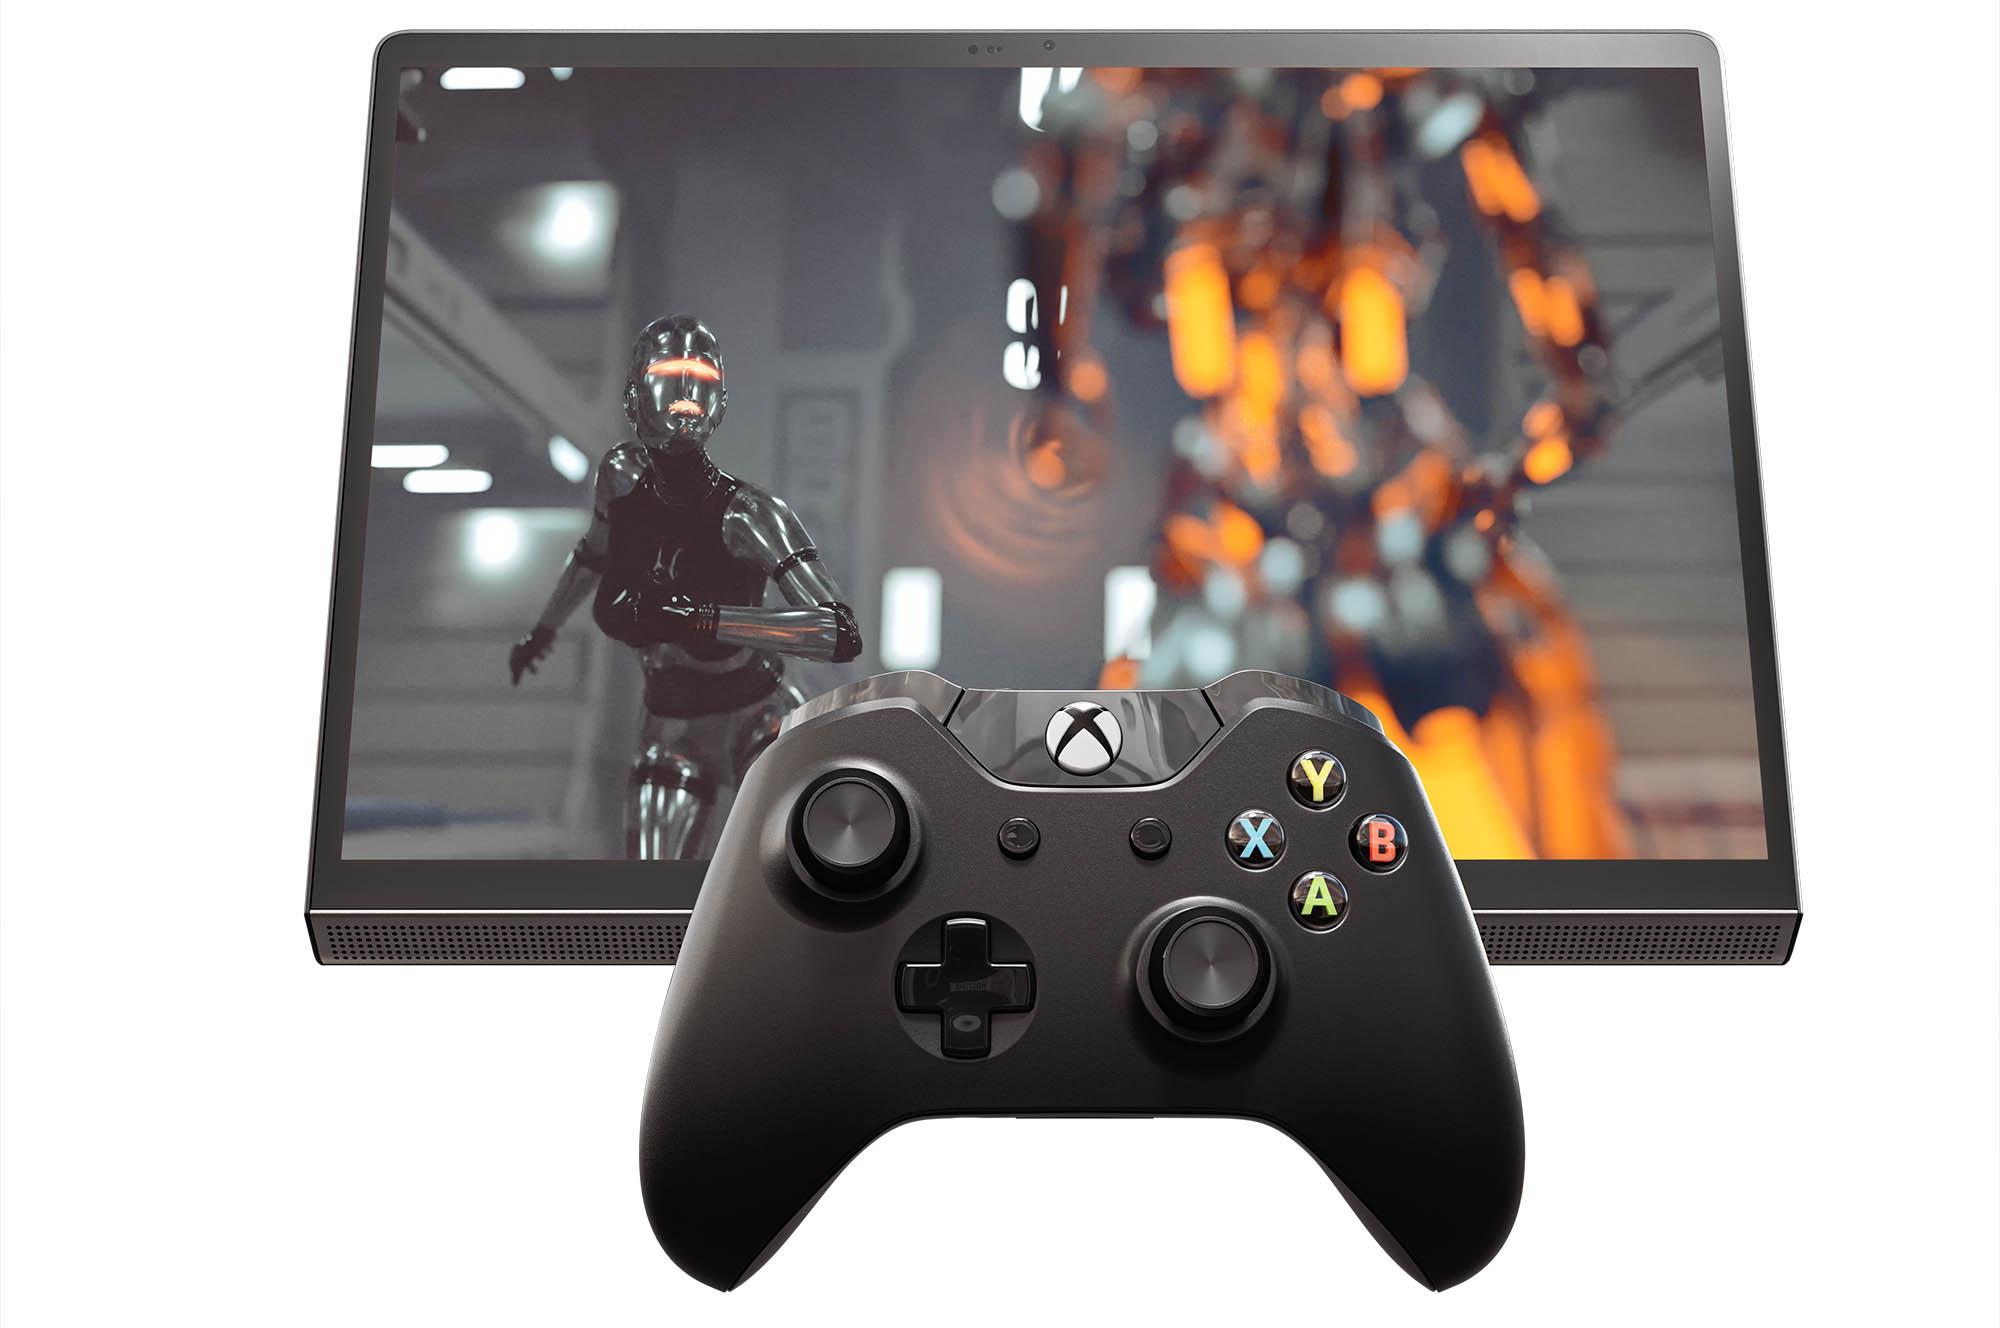 Lenovo Yoga Tab 13_Connectivity_Gaming Controller